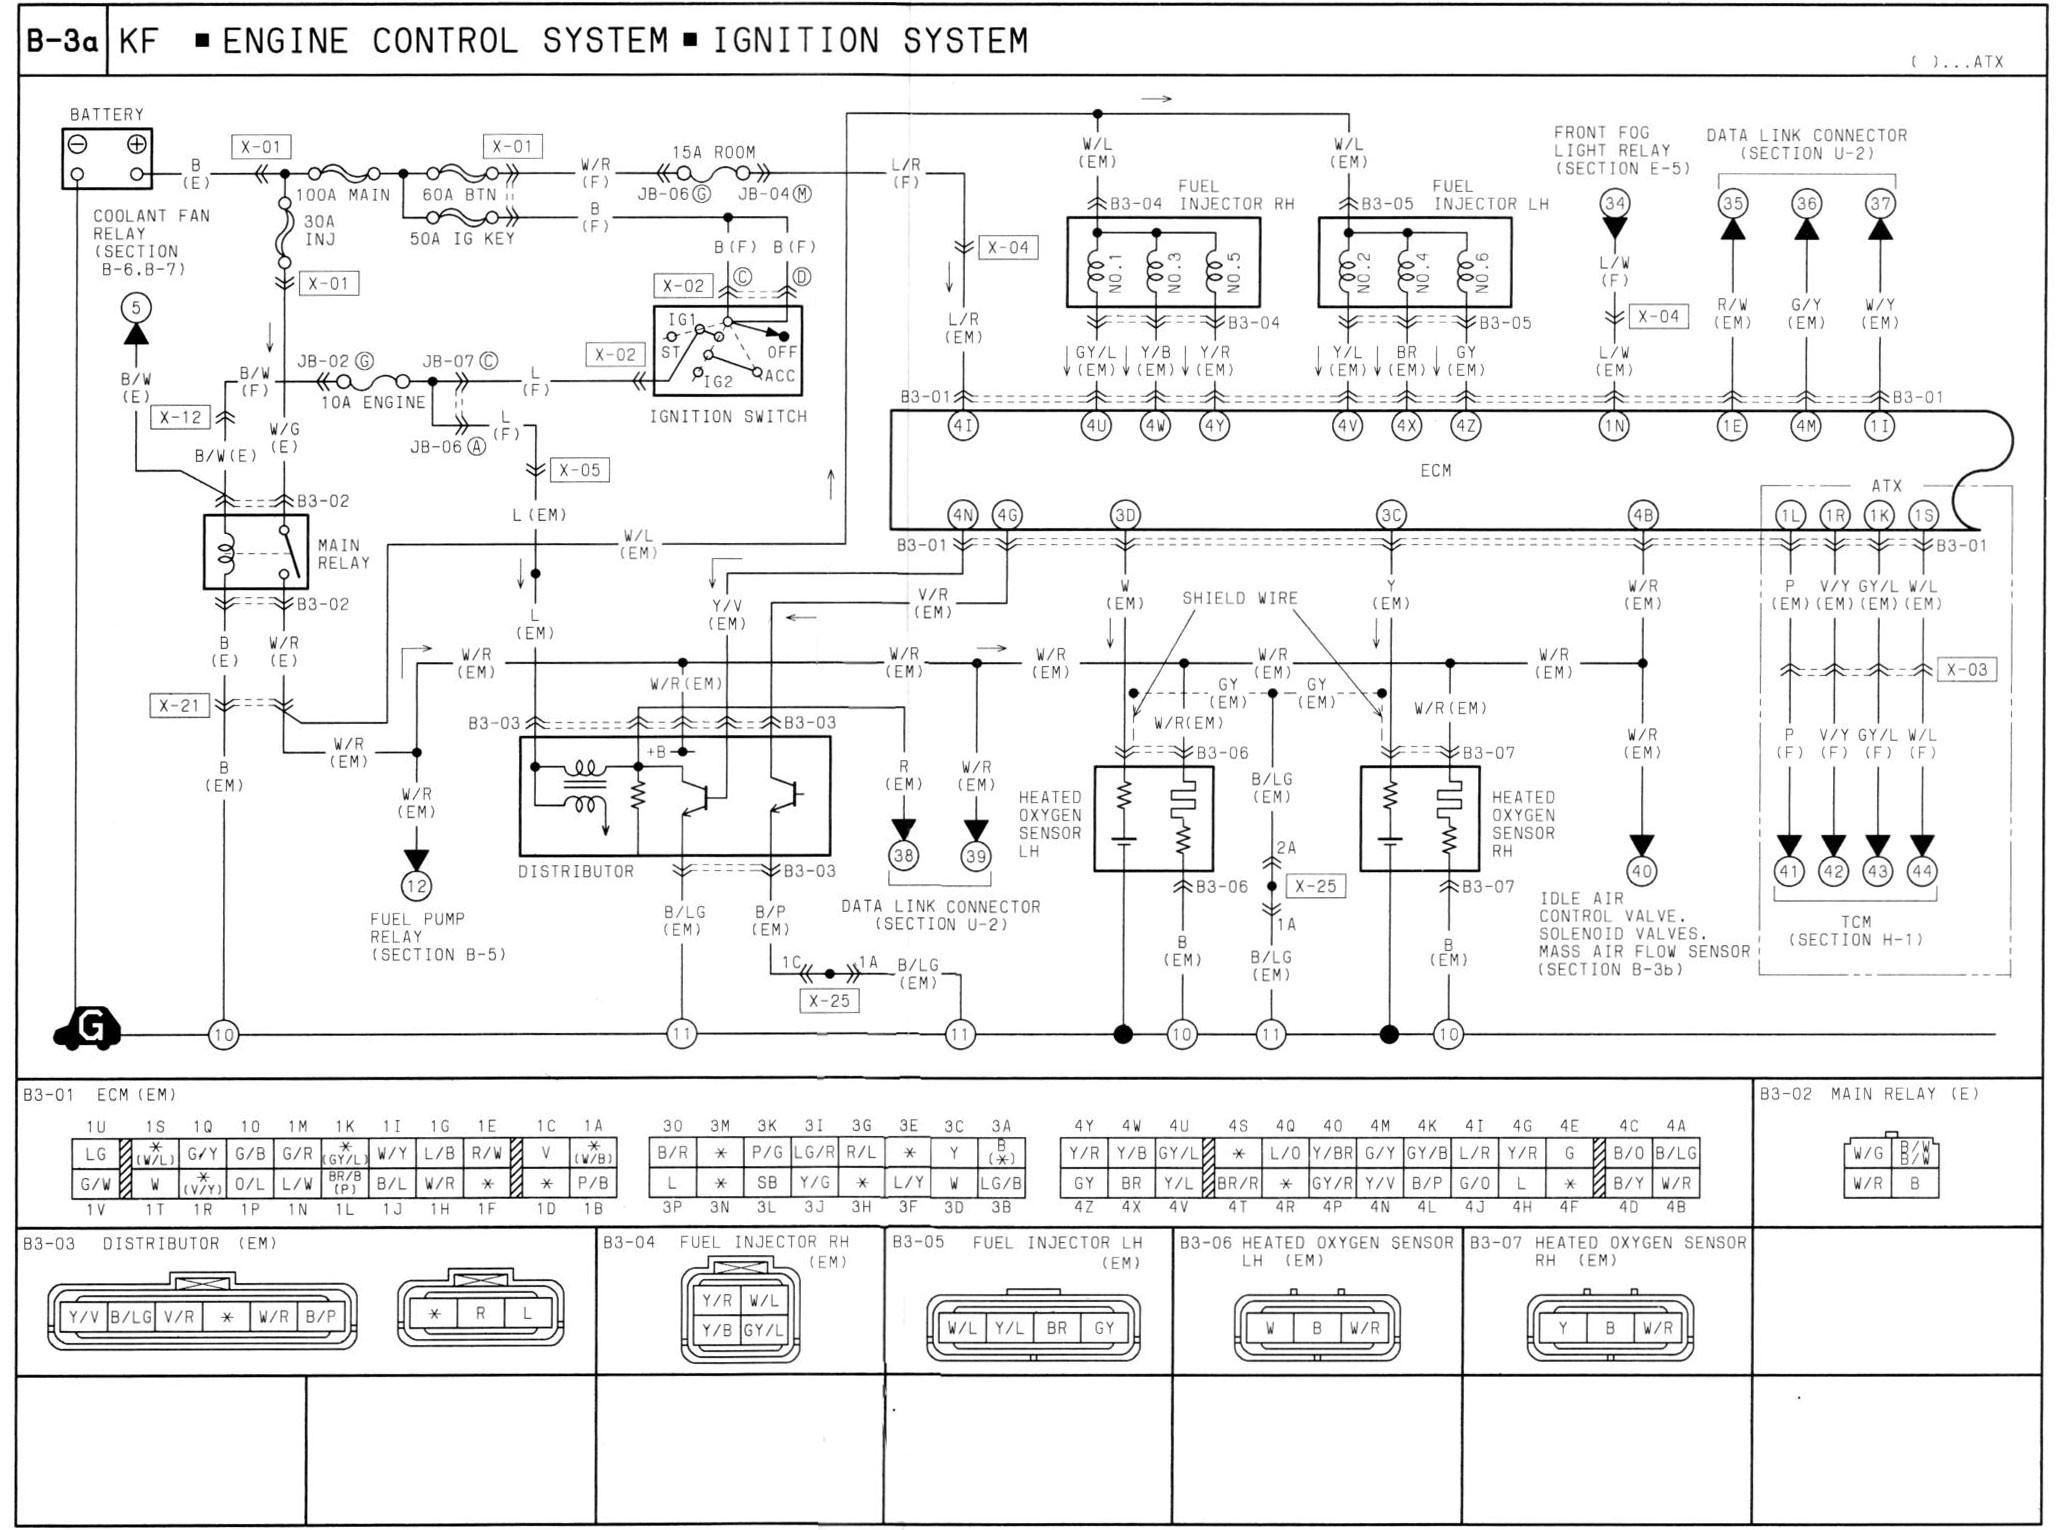 Mazda Wiring Diagram 323 Schematics Diagrams Omc 583653 Bj Relay Enthusiast U2022 Rh Bwpartnersautos Com Ignition